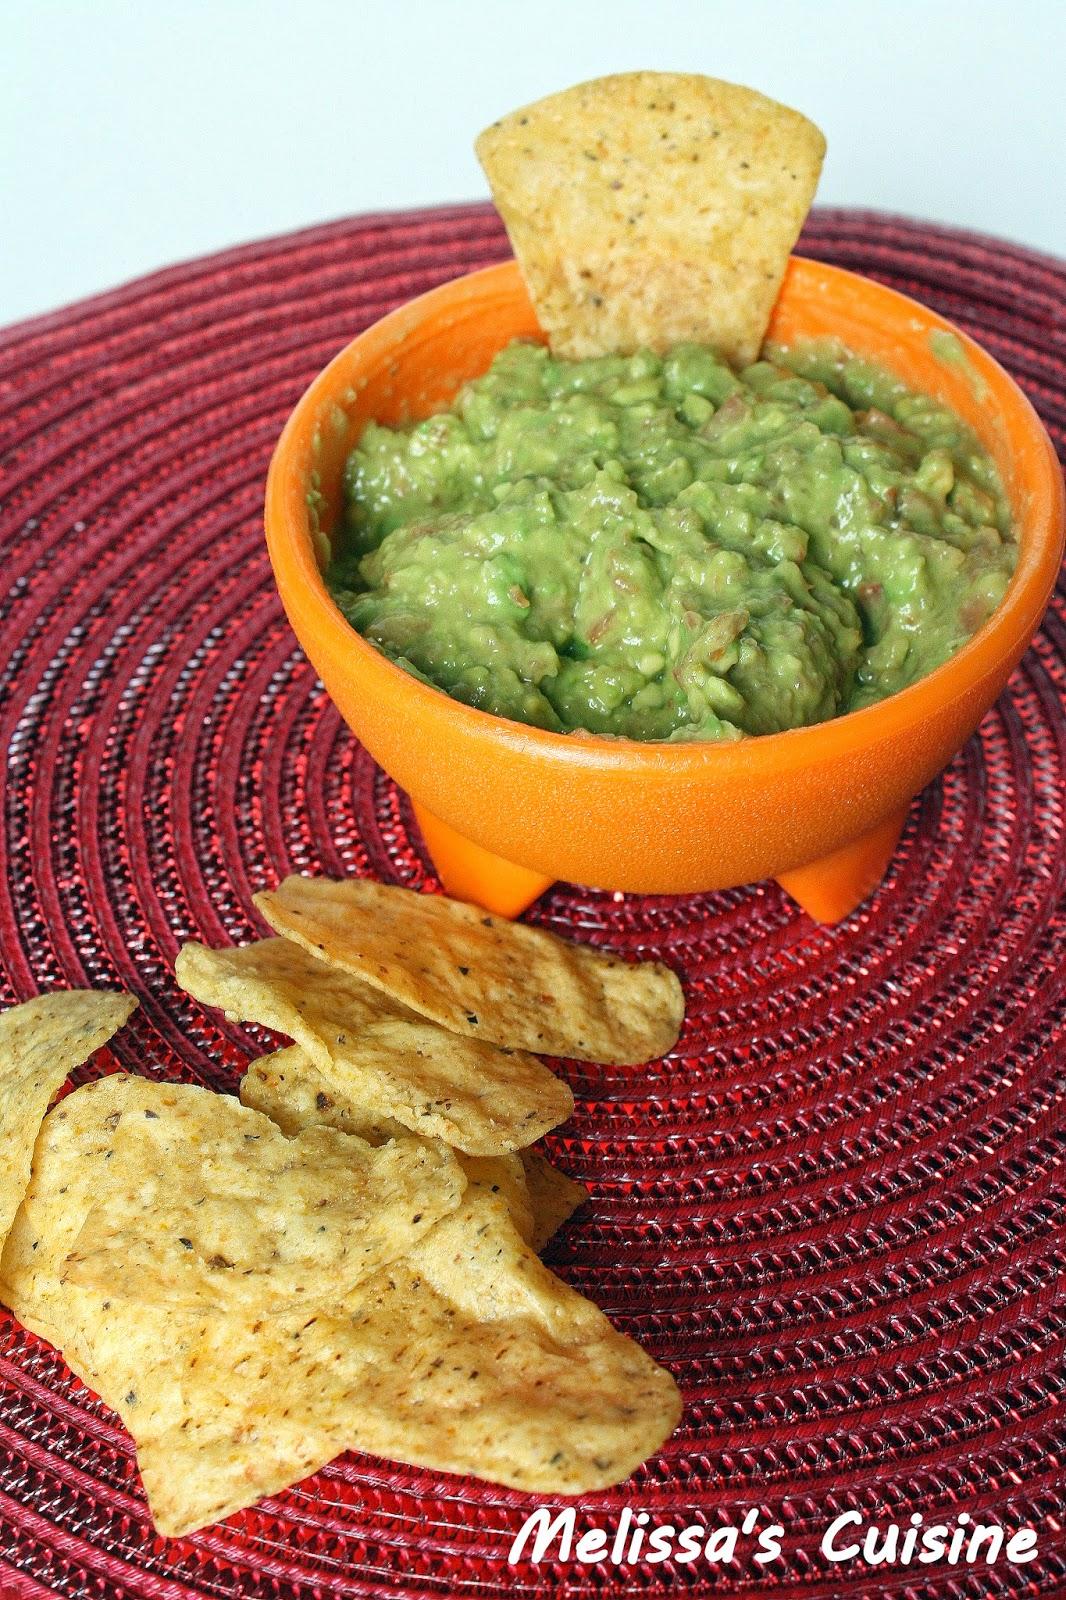 Melissa's Cuisine: Zesty Guacamole